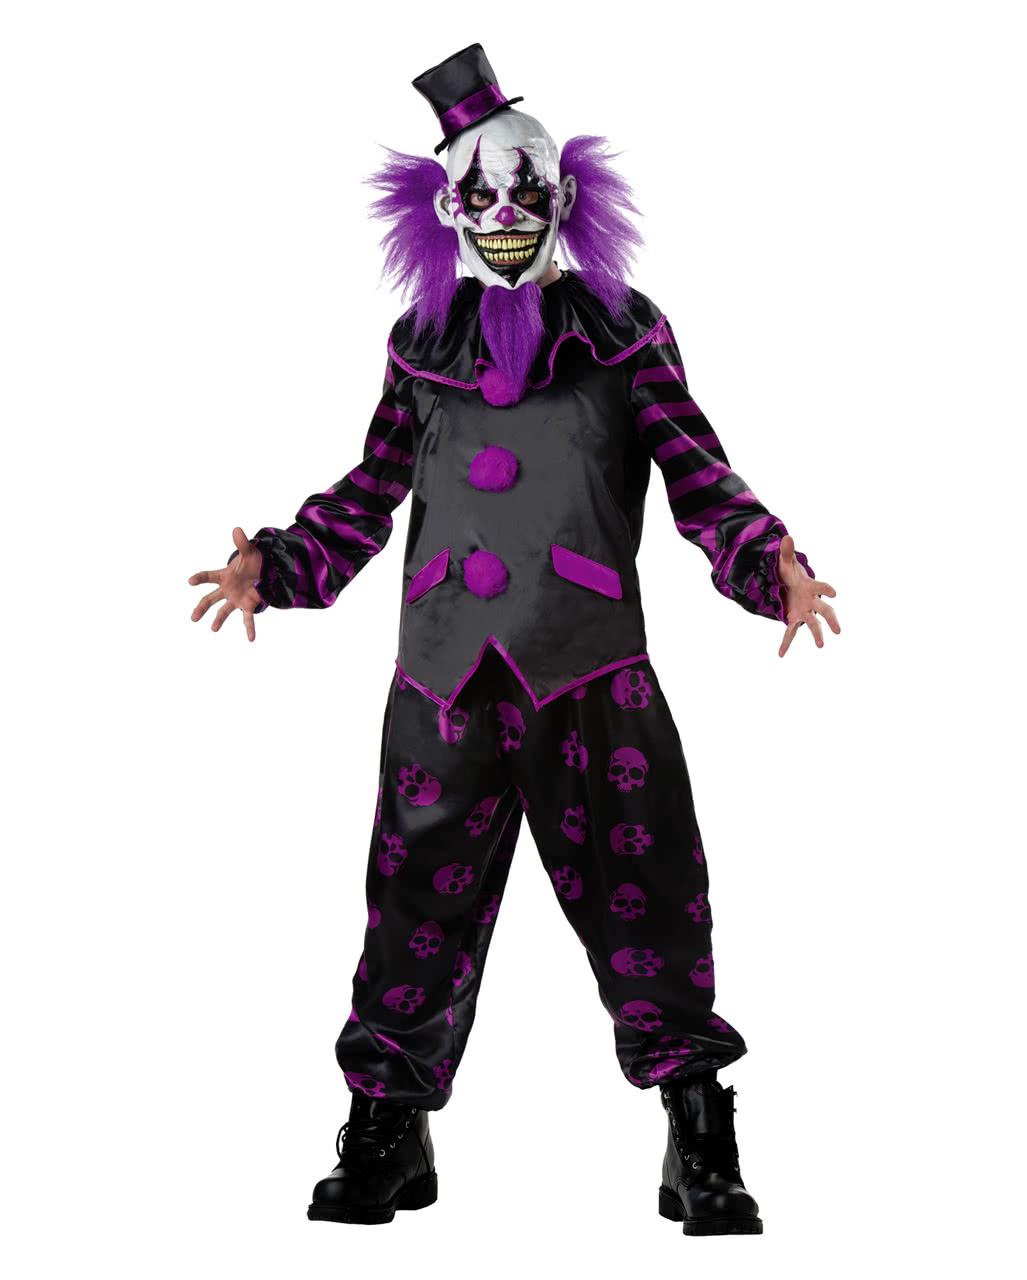 Horror clown costume with mask | Horror panel | horror-shop.com